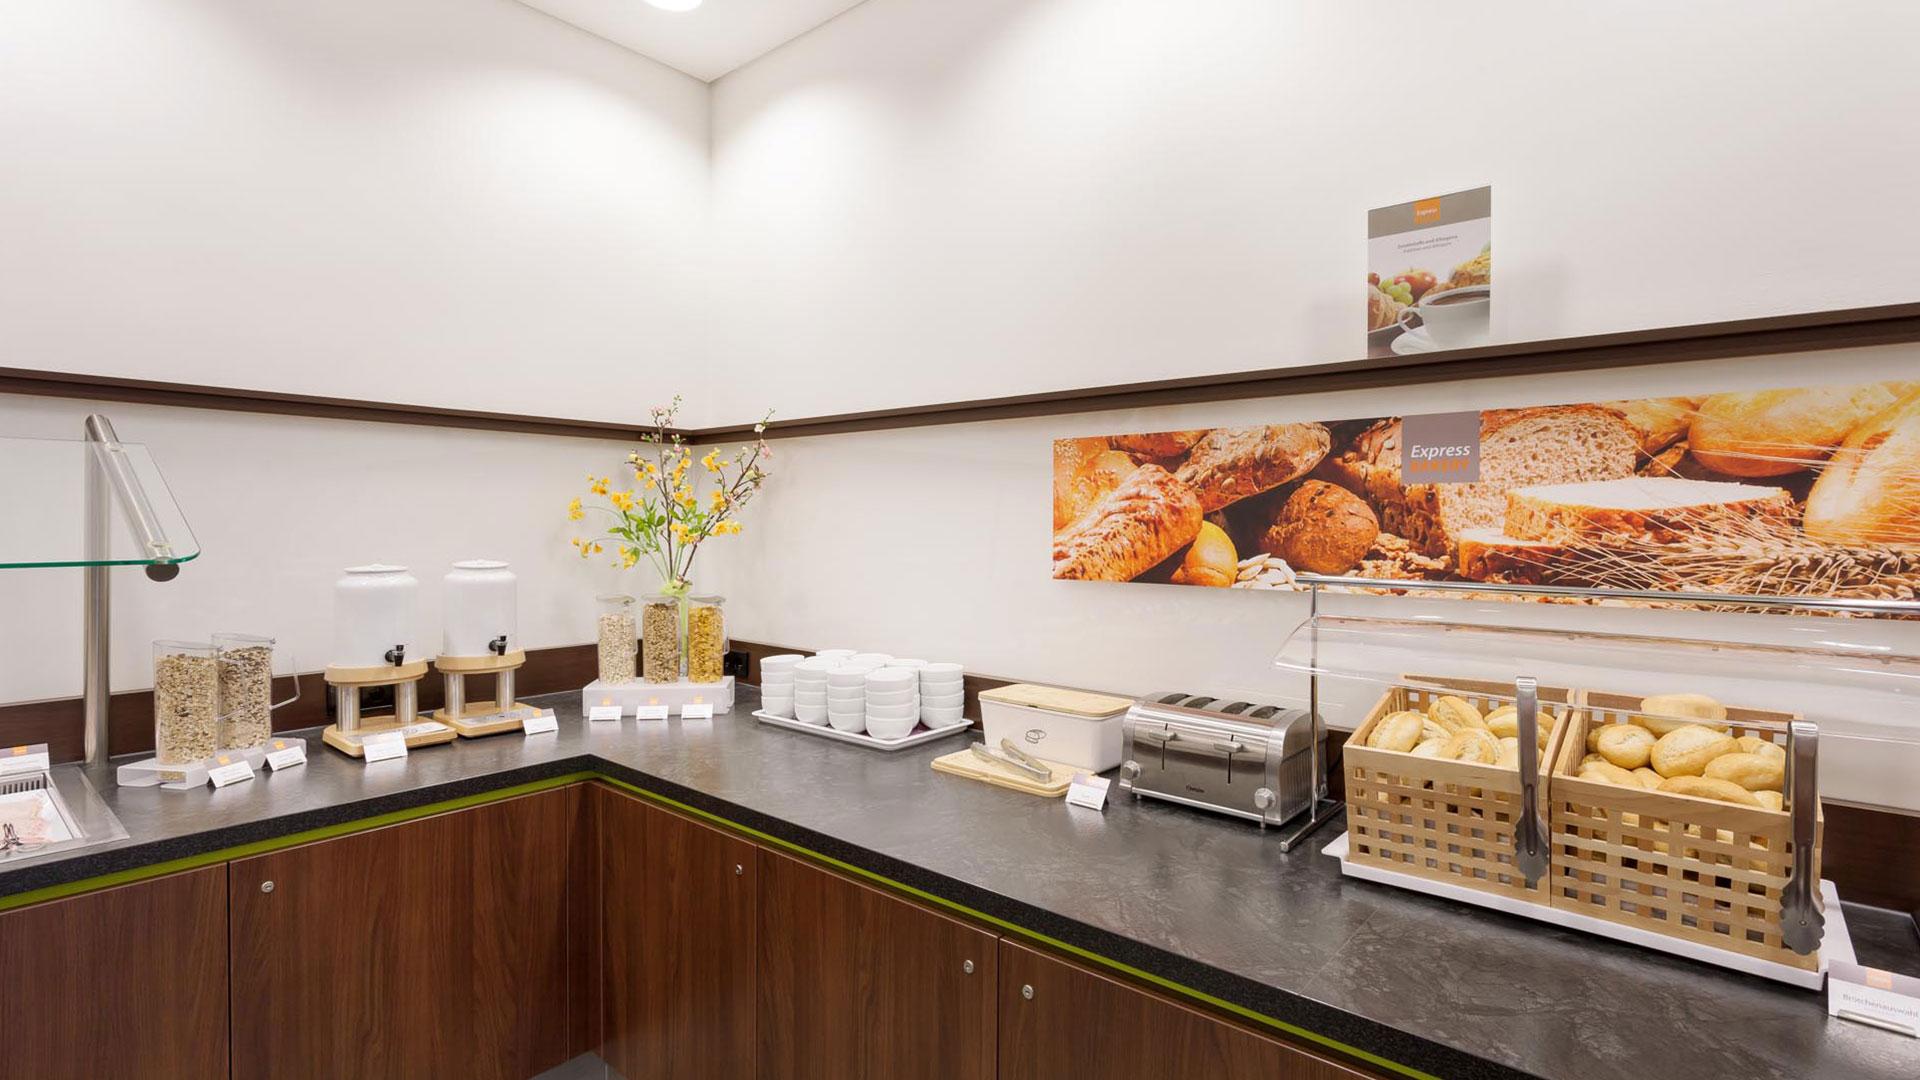 Photo of breakfast - 03 - Holiday Inn Express Augsburg